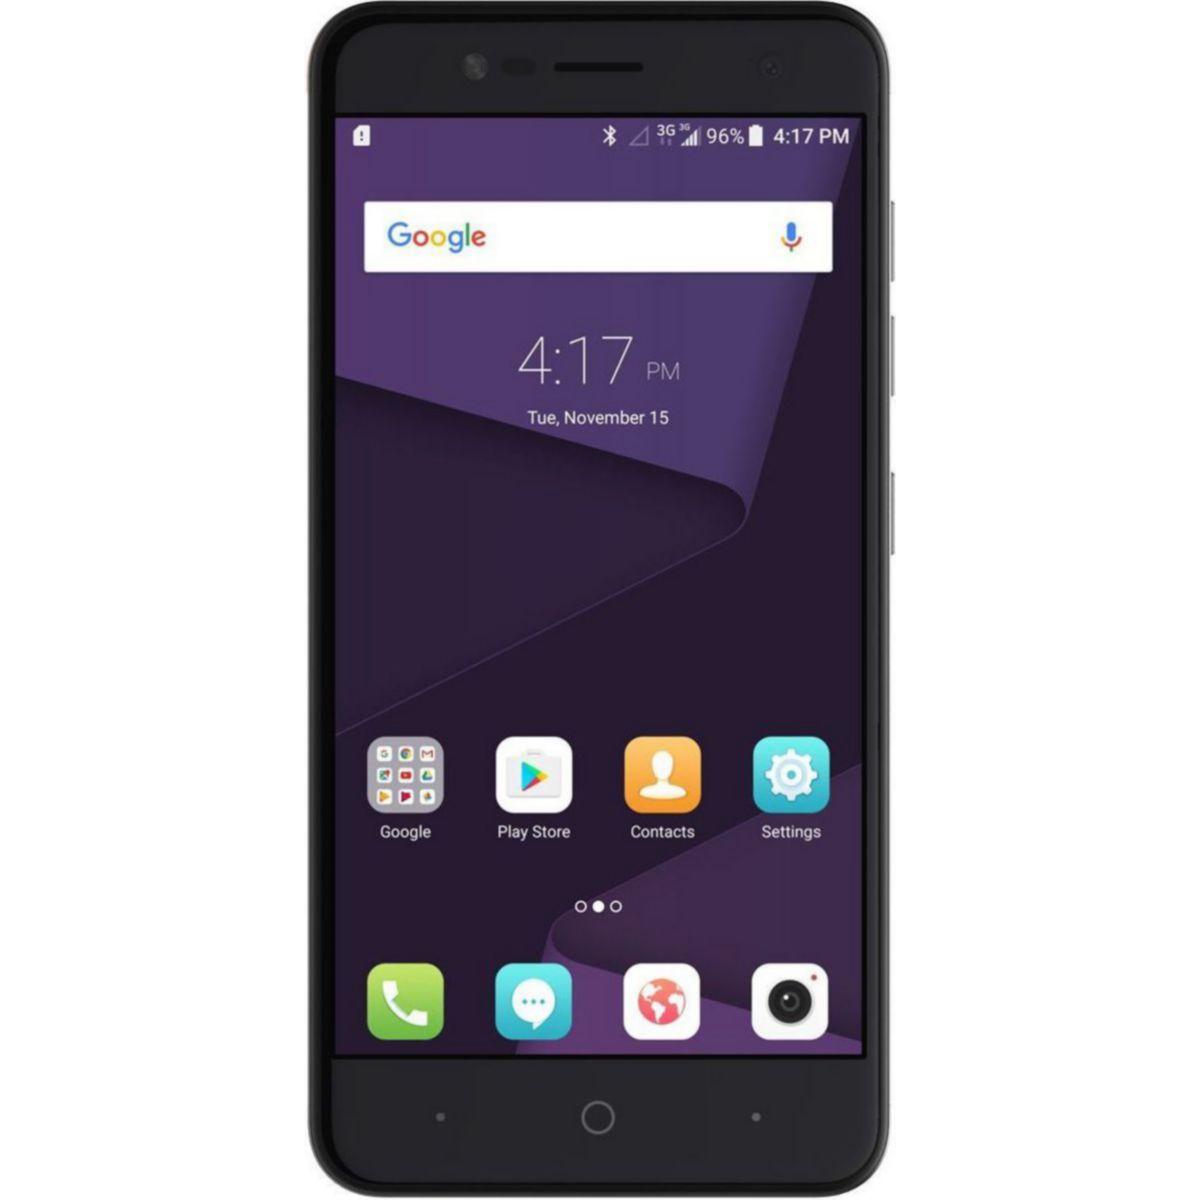 ZTE Blade V8 Mini - Smartphone Dual-SIM 4G LTE 16GB microSDXC slot GSM 12,70cm (5) 1,280 x 720 Pixel IPS RAM 2GB 13 MP (5 Vorderkamera) Android Schwarz (126666001025) jetztbilligerkaufen